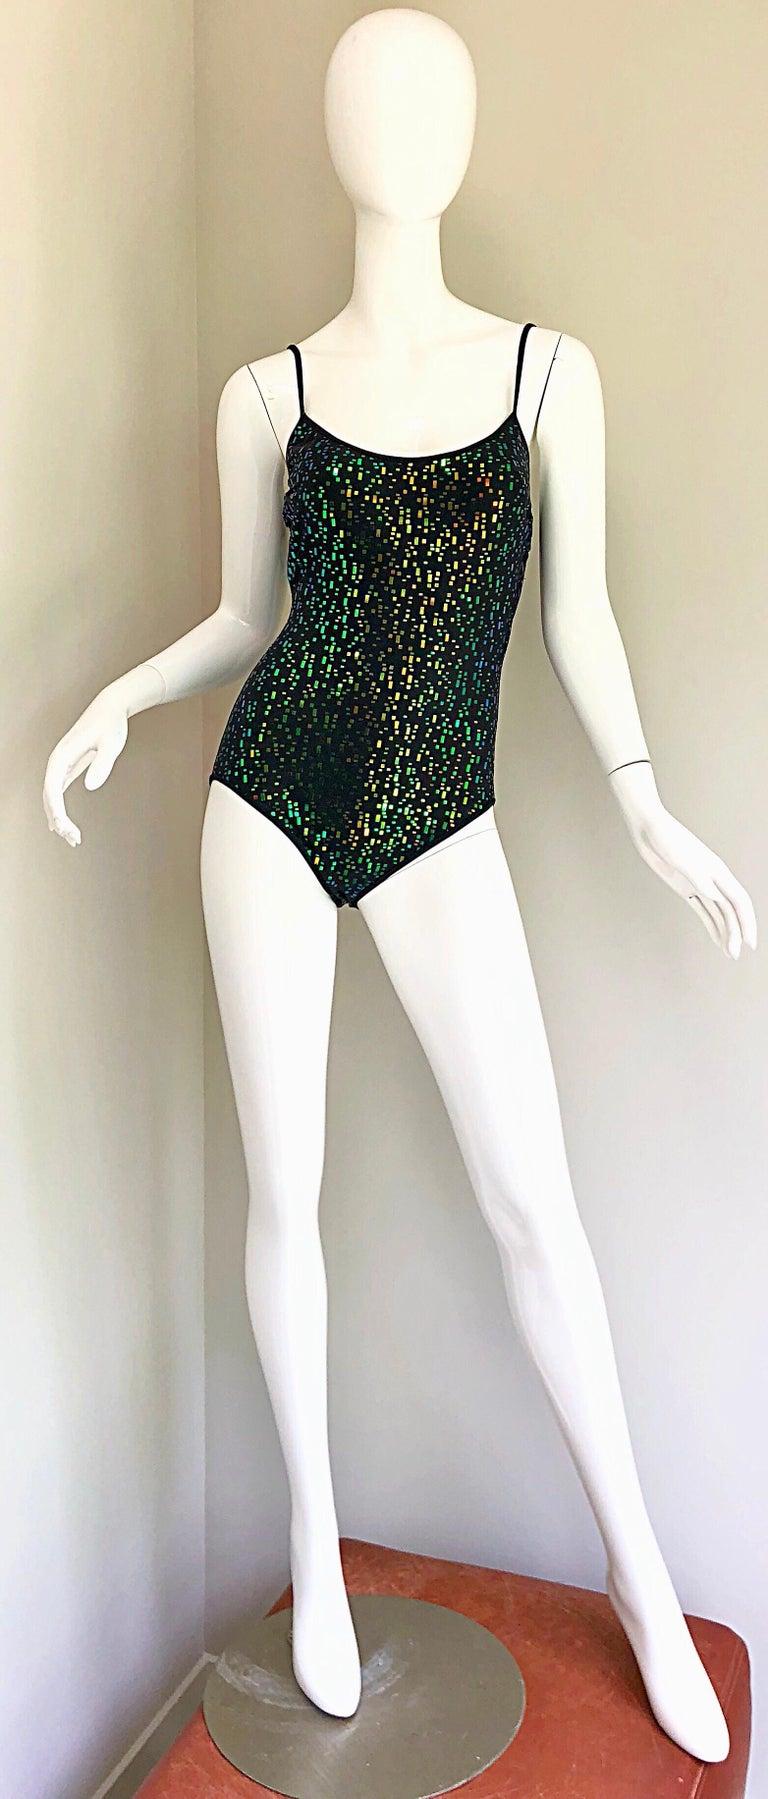 Vintage Oscar de la Renta 90s New w/ Tags Blue Green Sequined One Piece Swimsuit For Sale 8